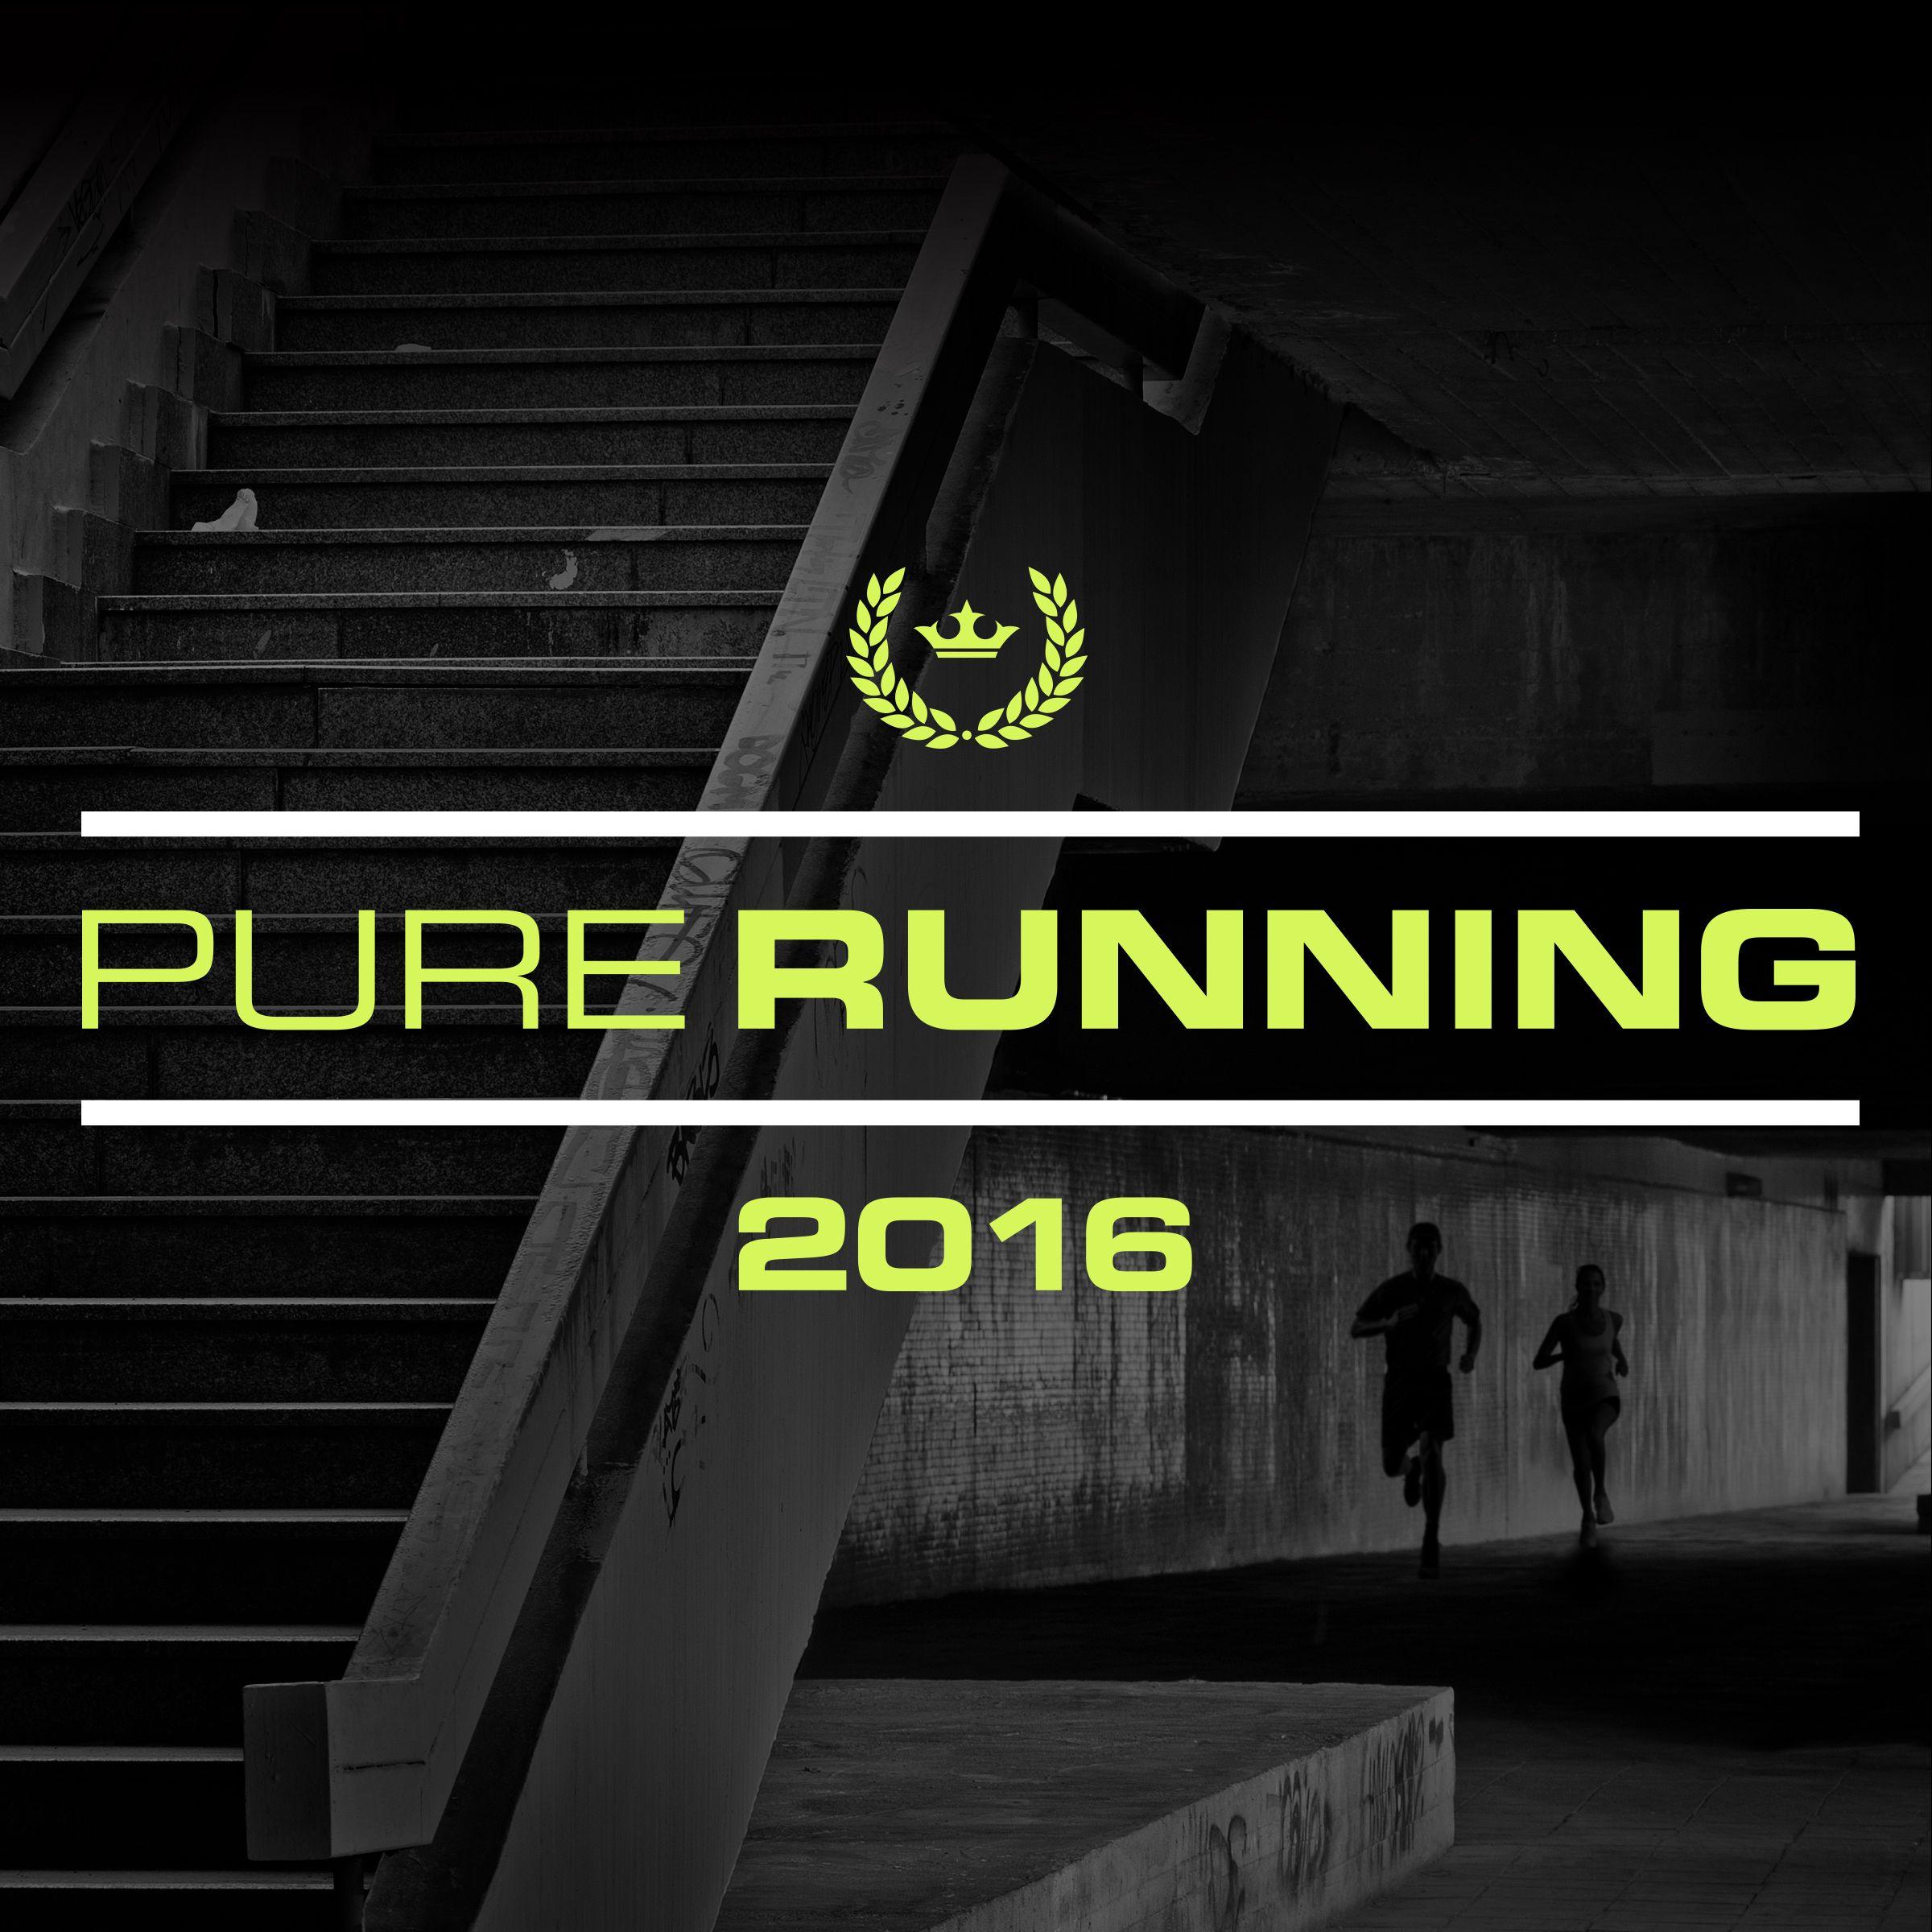 pure_running_2016.jpeg